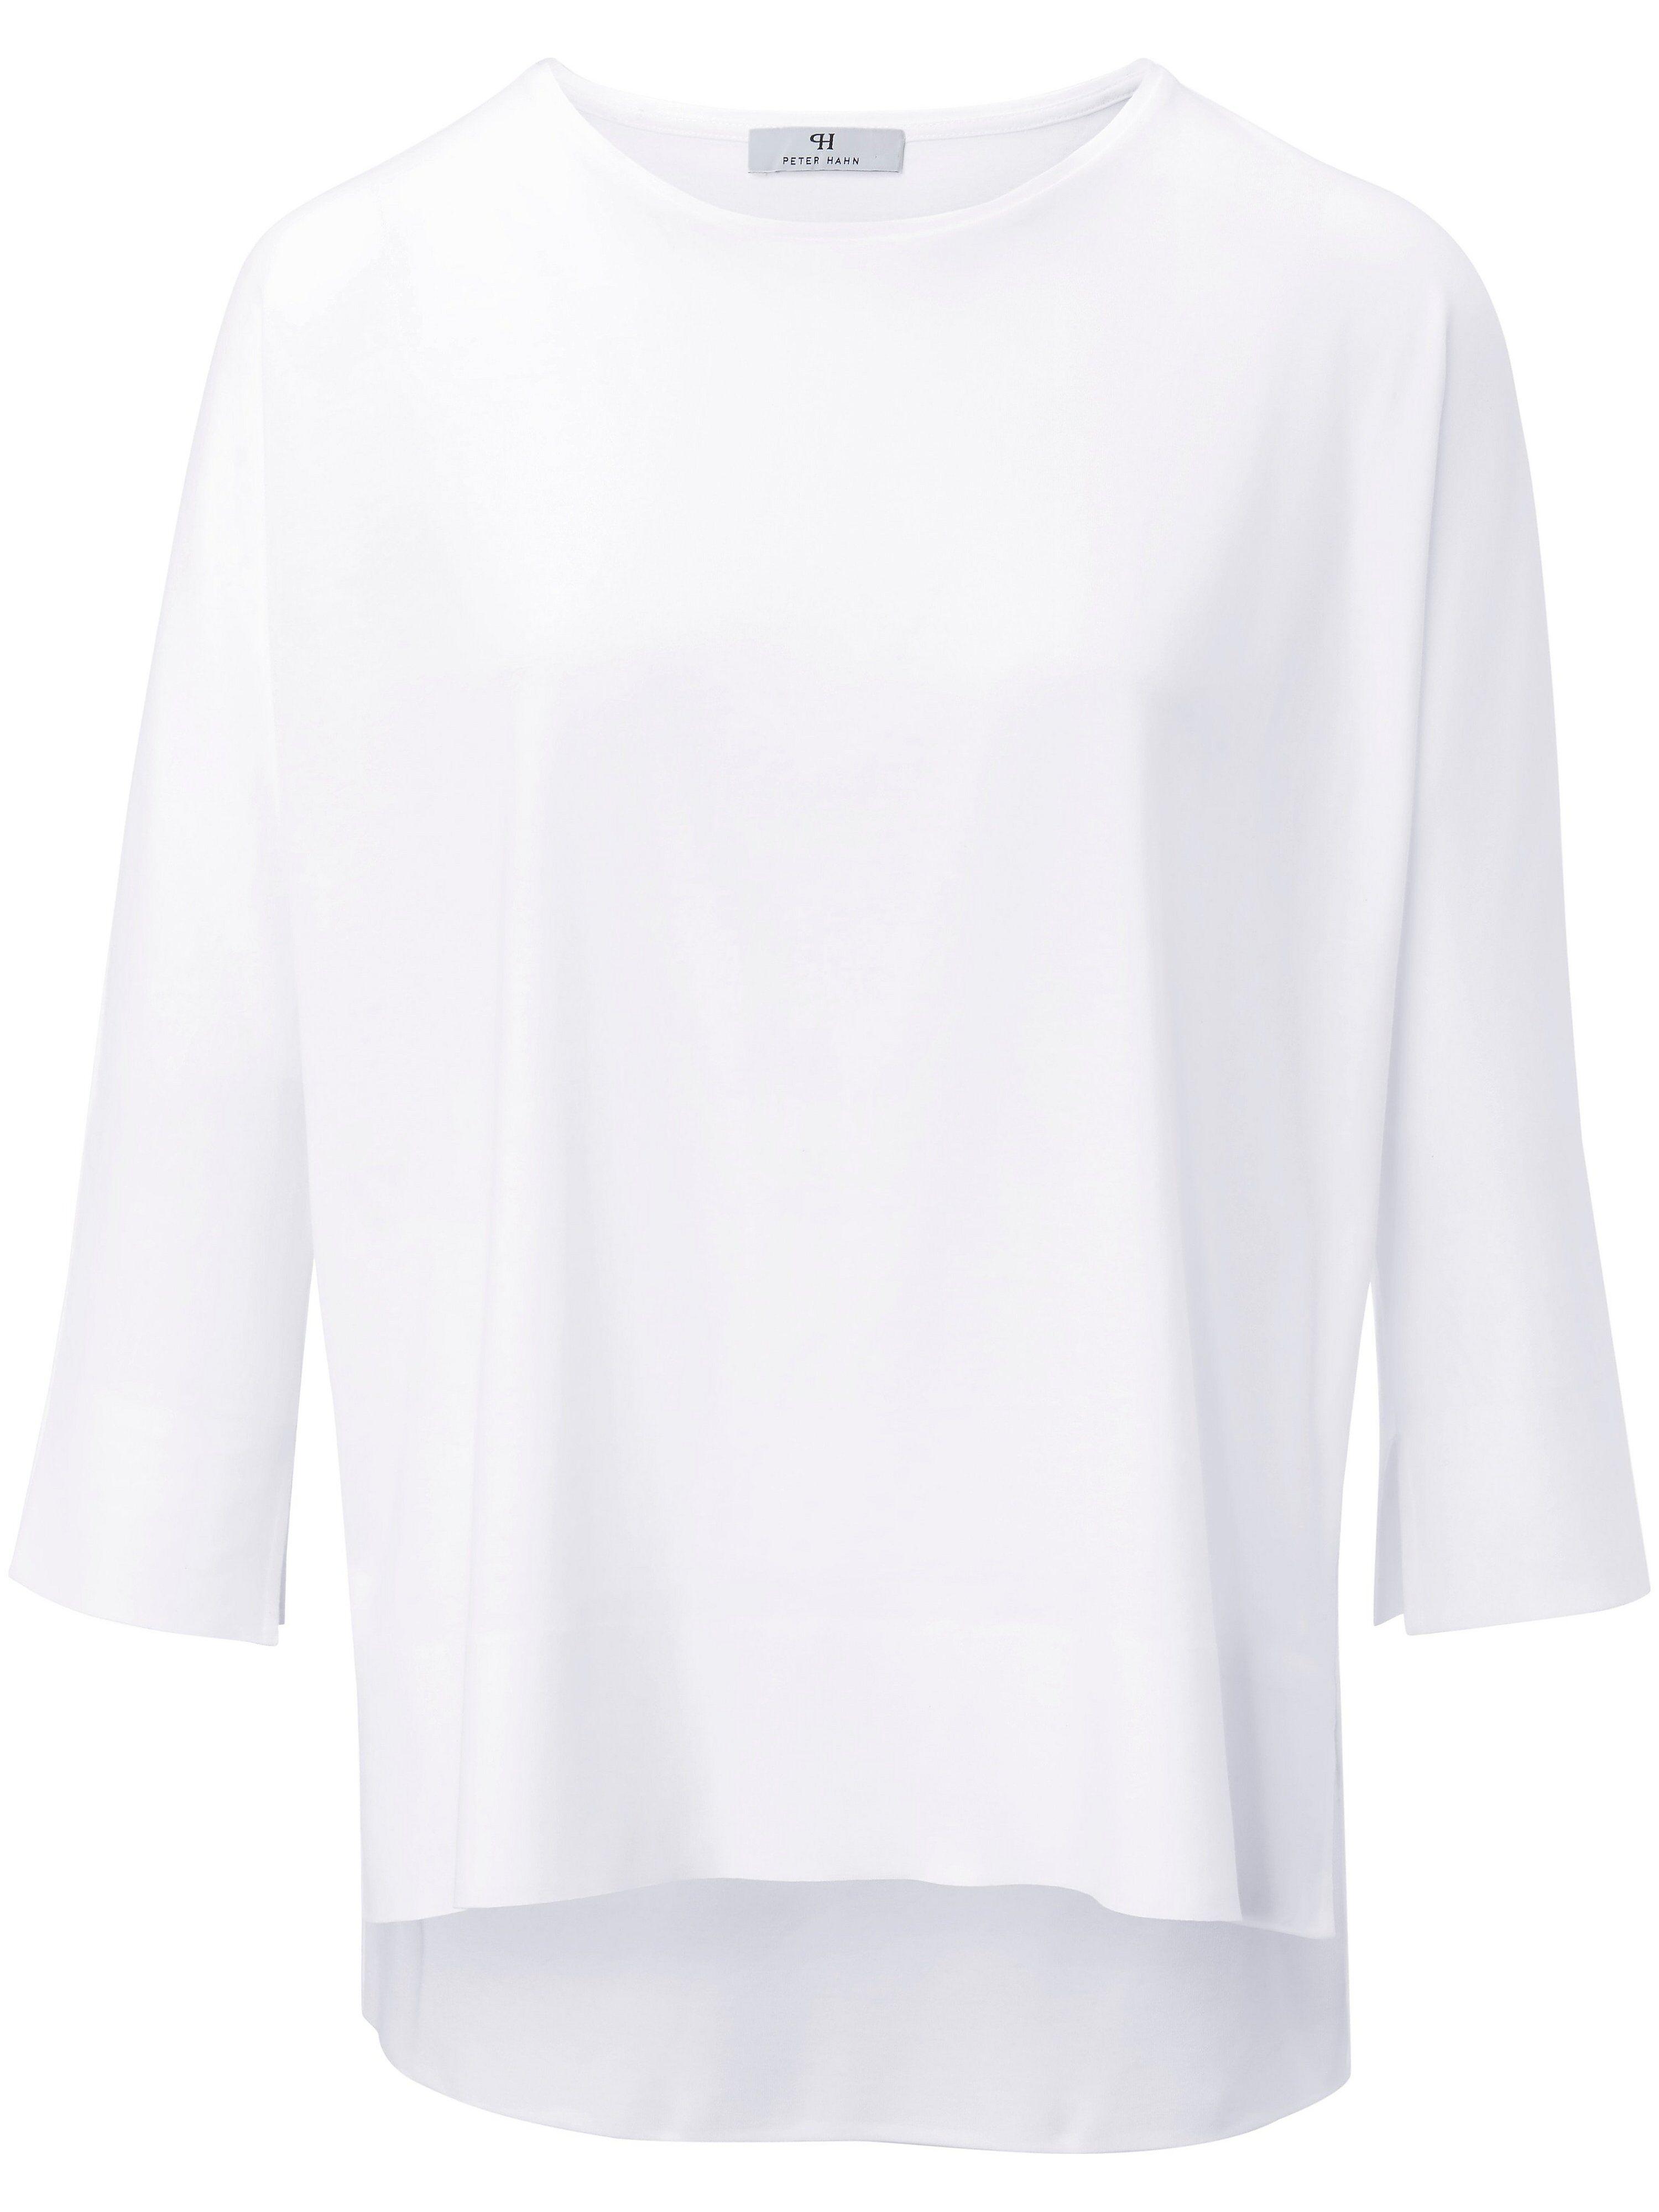 Peter Hahn Le T-shirt 100% coton à manches 3/4  Peter Hahn blanc  - Femme - 38